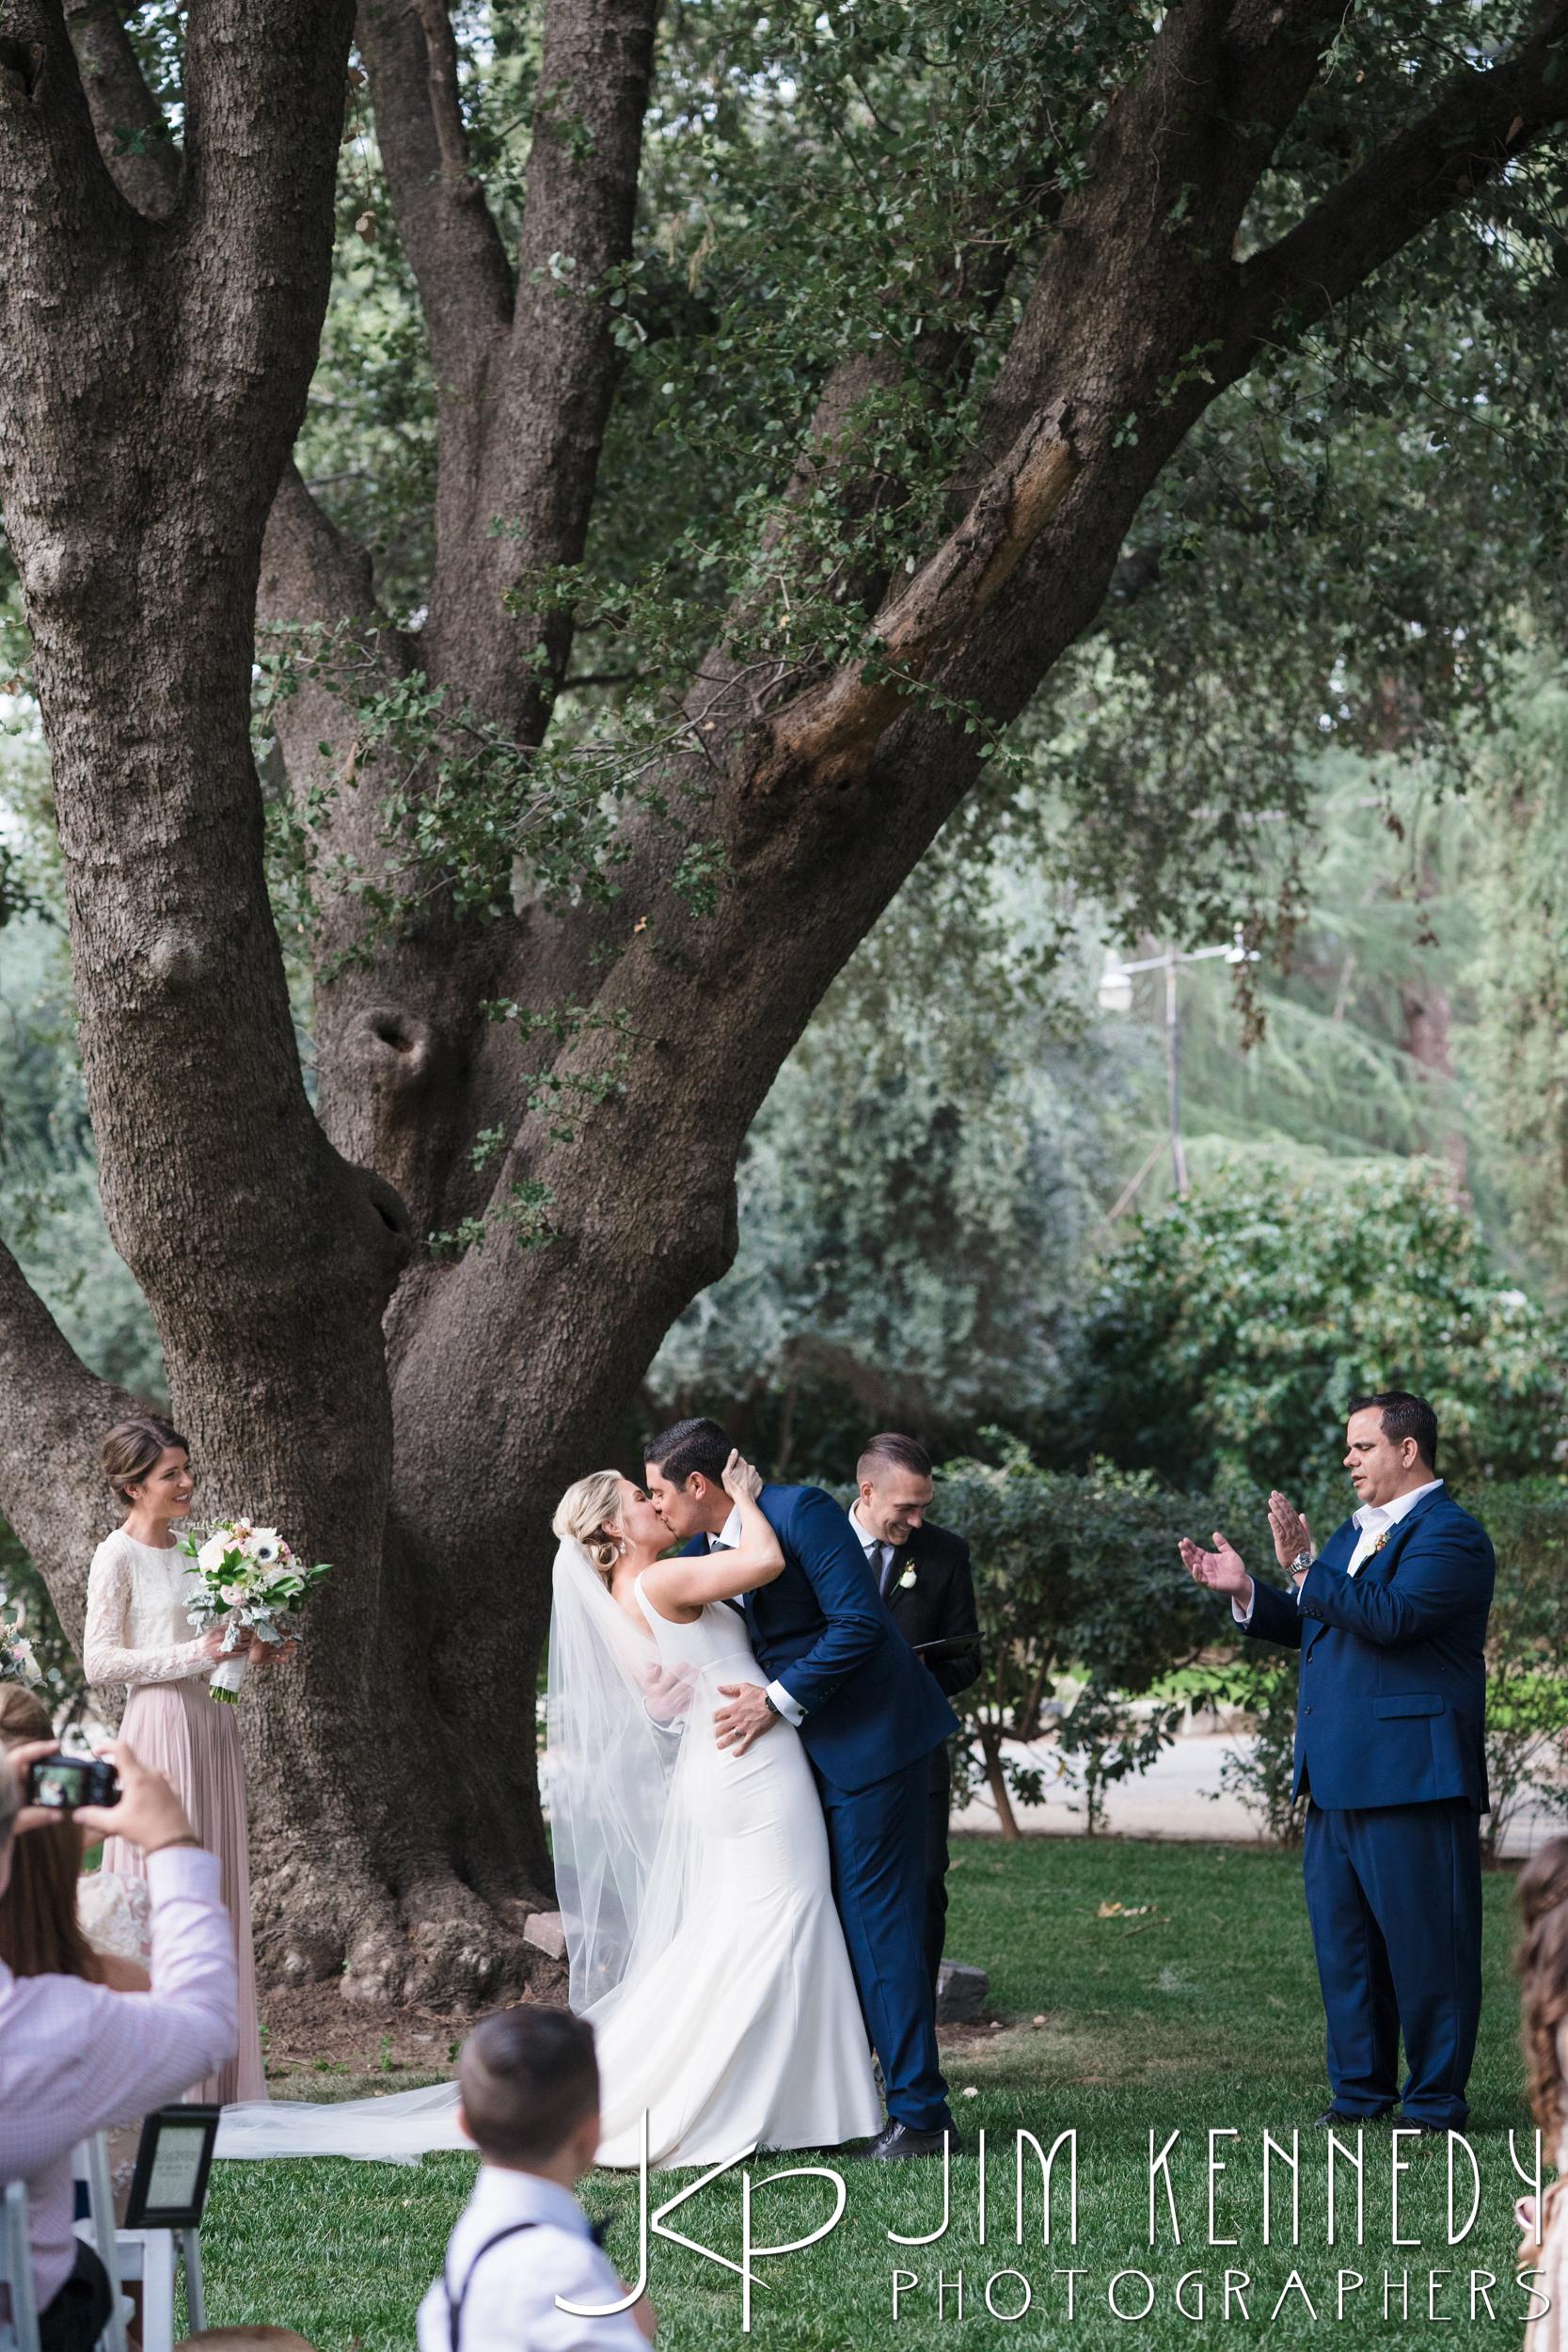 jim_kennedy_photographers_highland_springs_wedding_caitlyn_0119.jpg